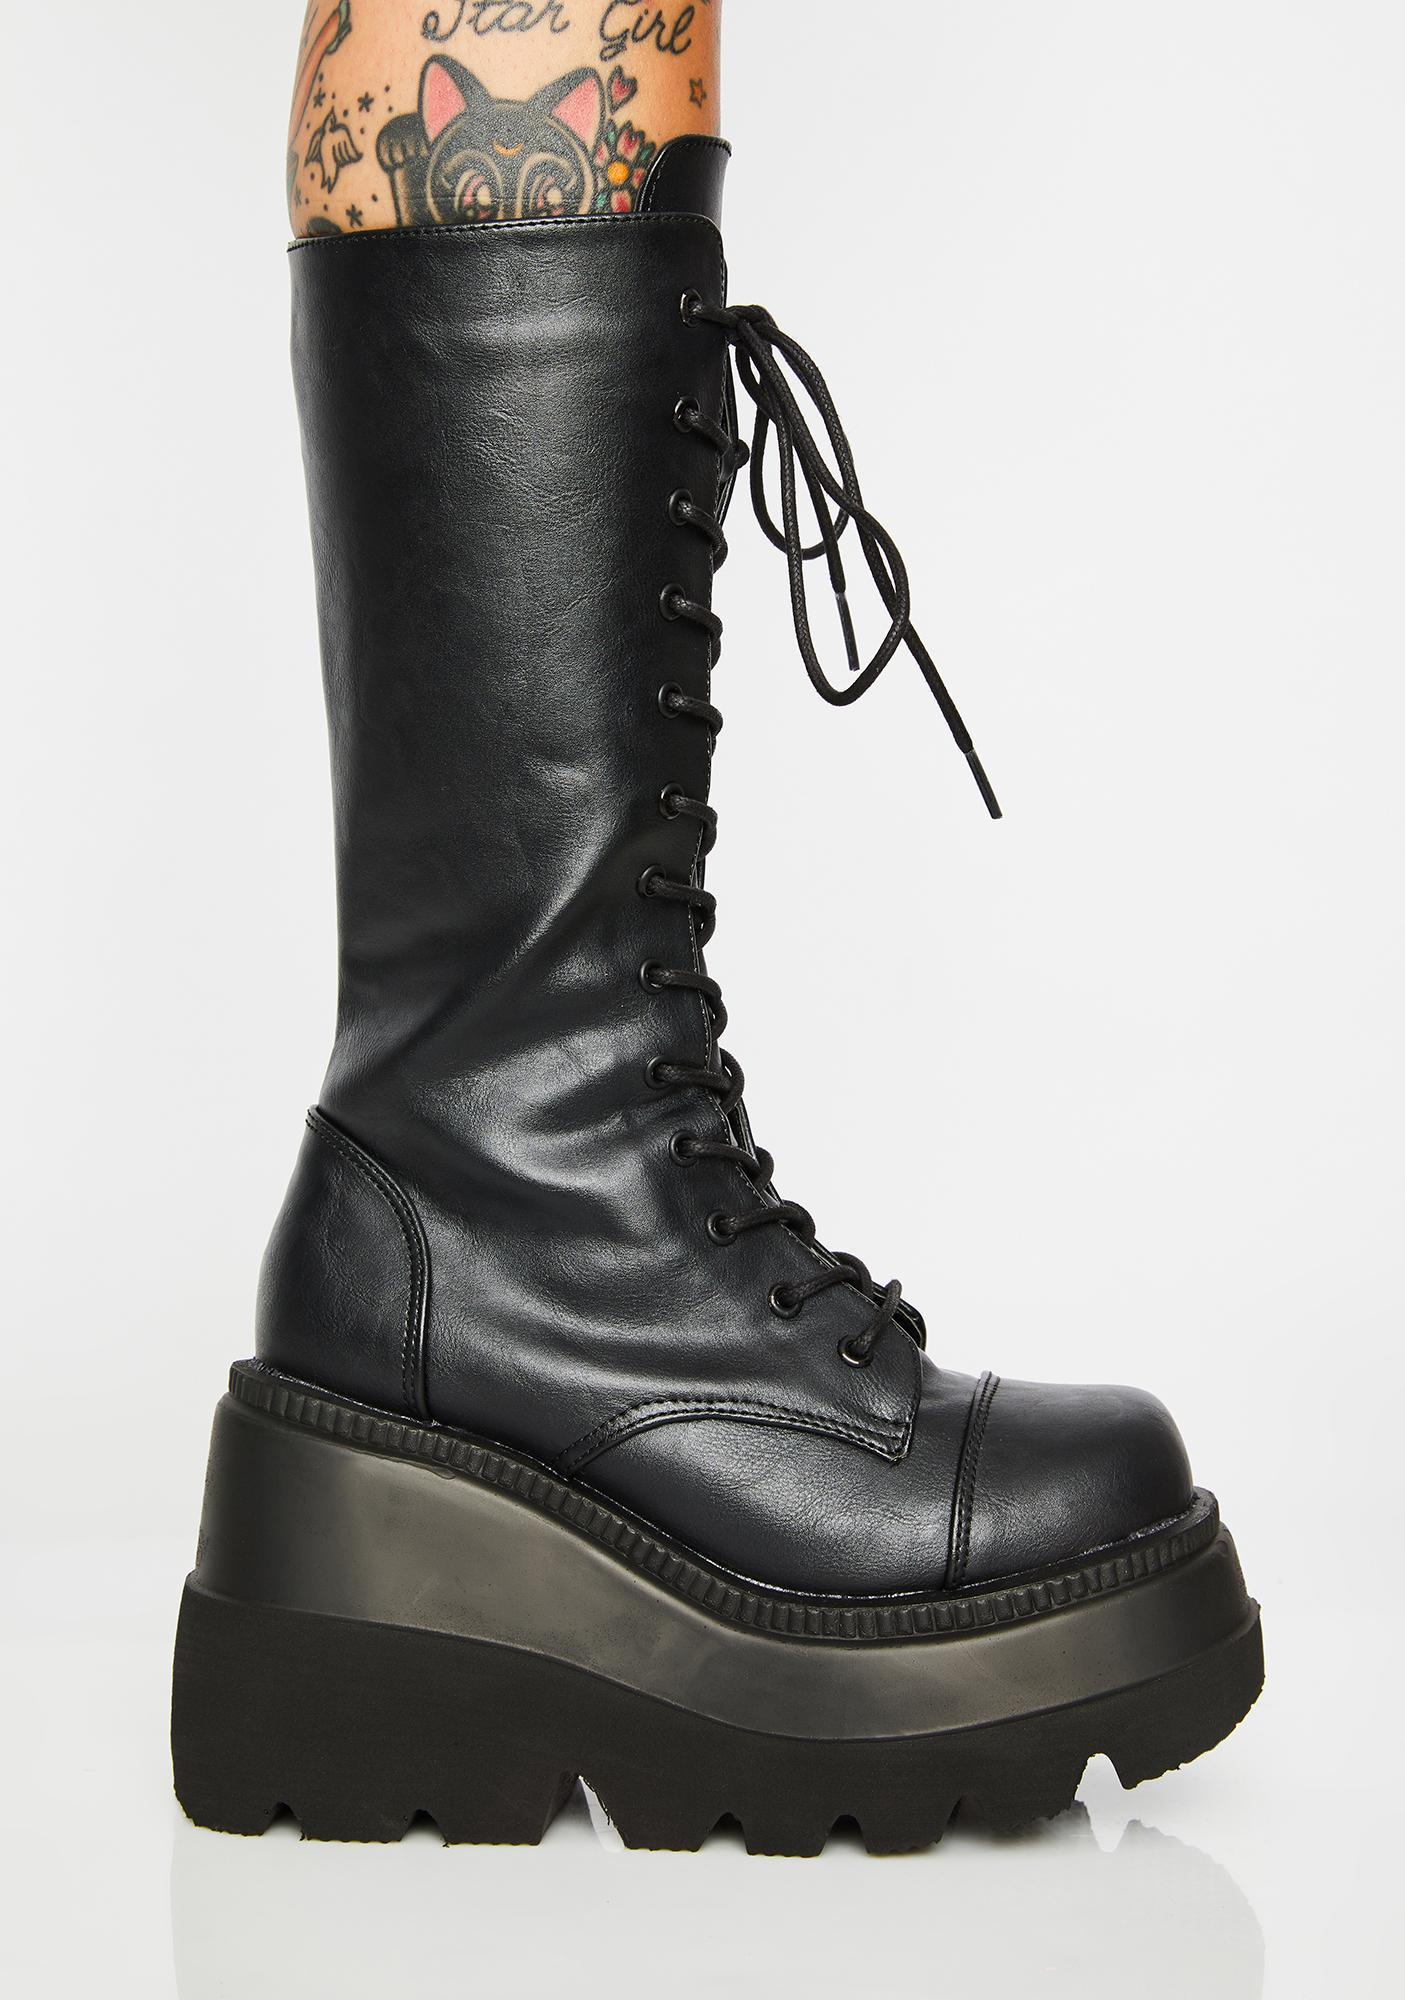 Demonia Wicked Twist Shaker Boots